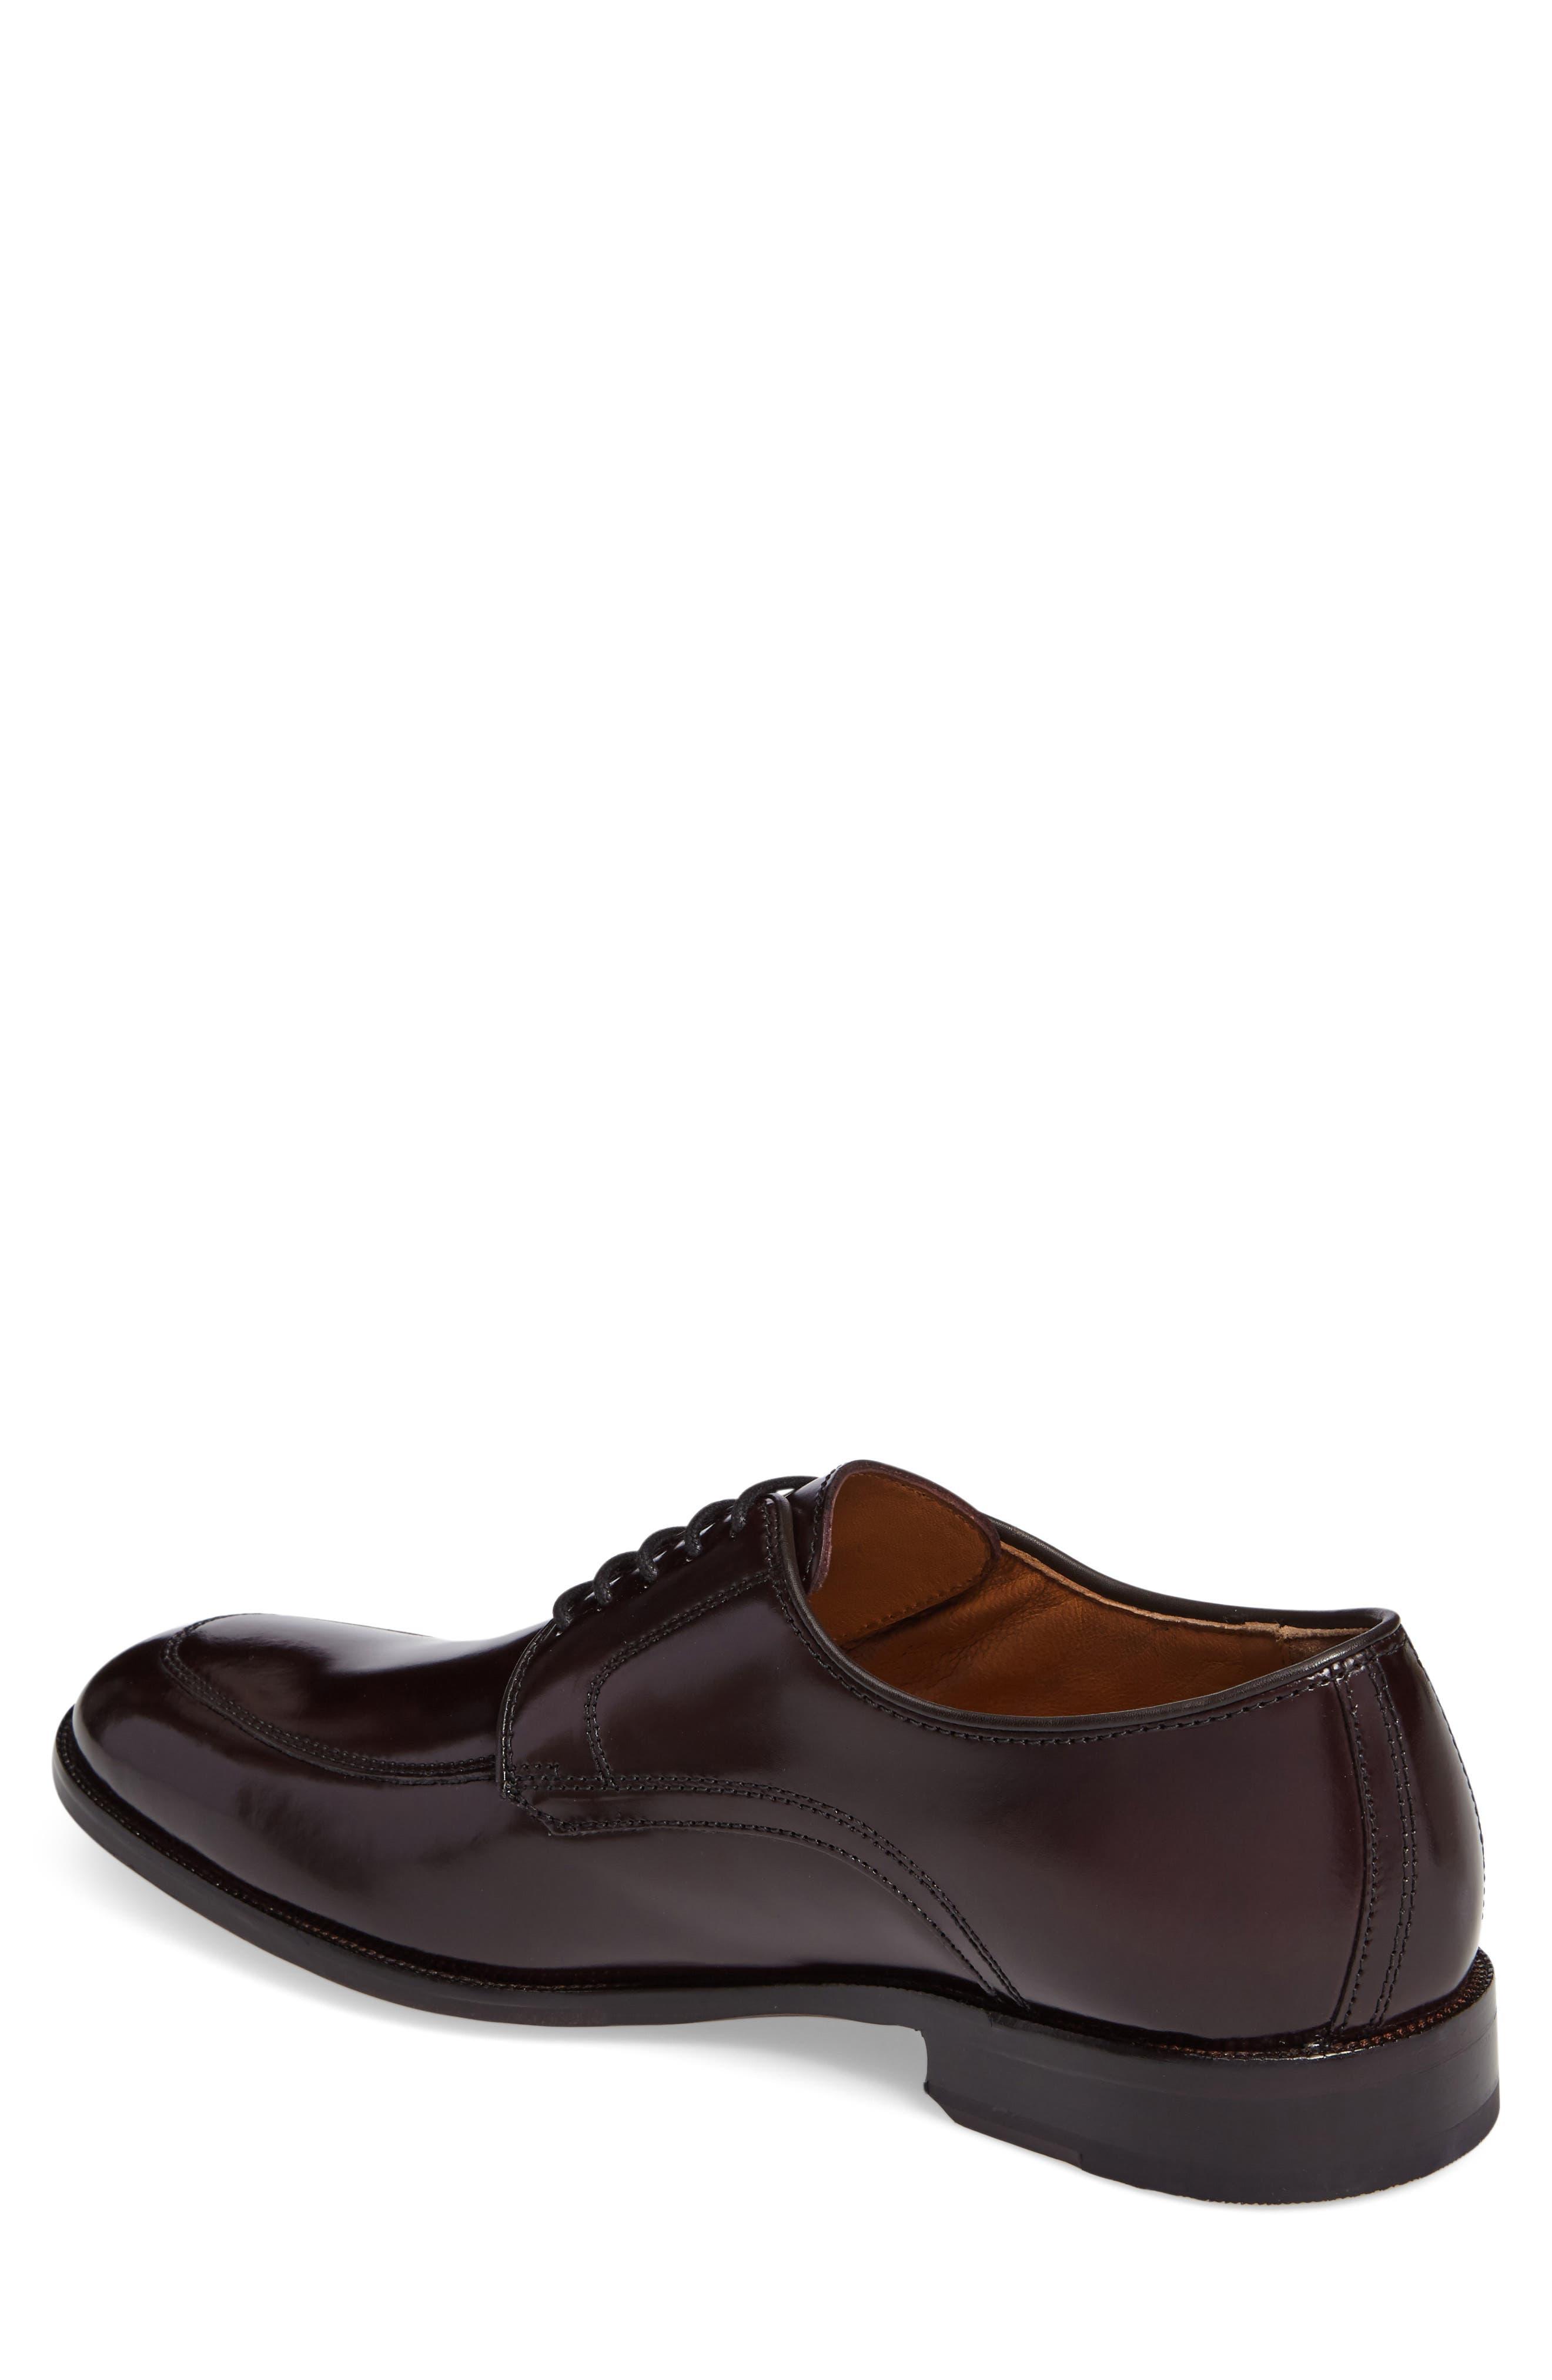 Bradford Apron-Toe Oxford,                             Alternate thumbnail 2, color,                             Burgundy Leather